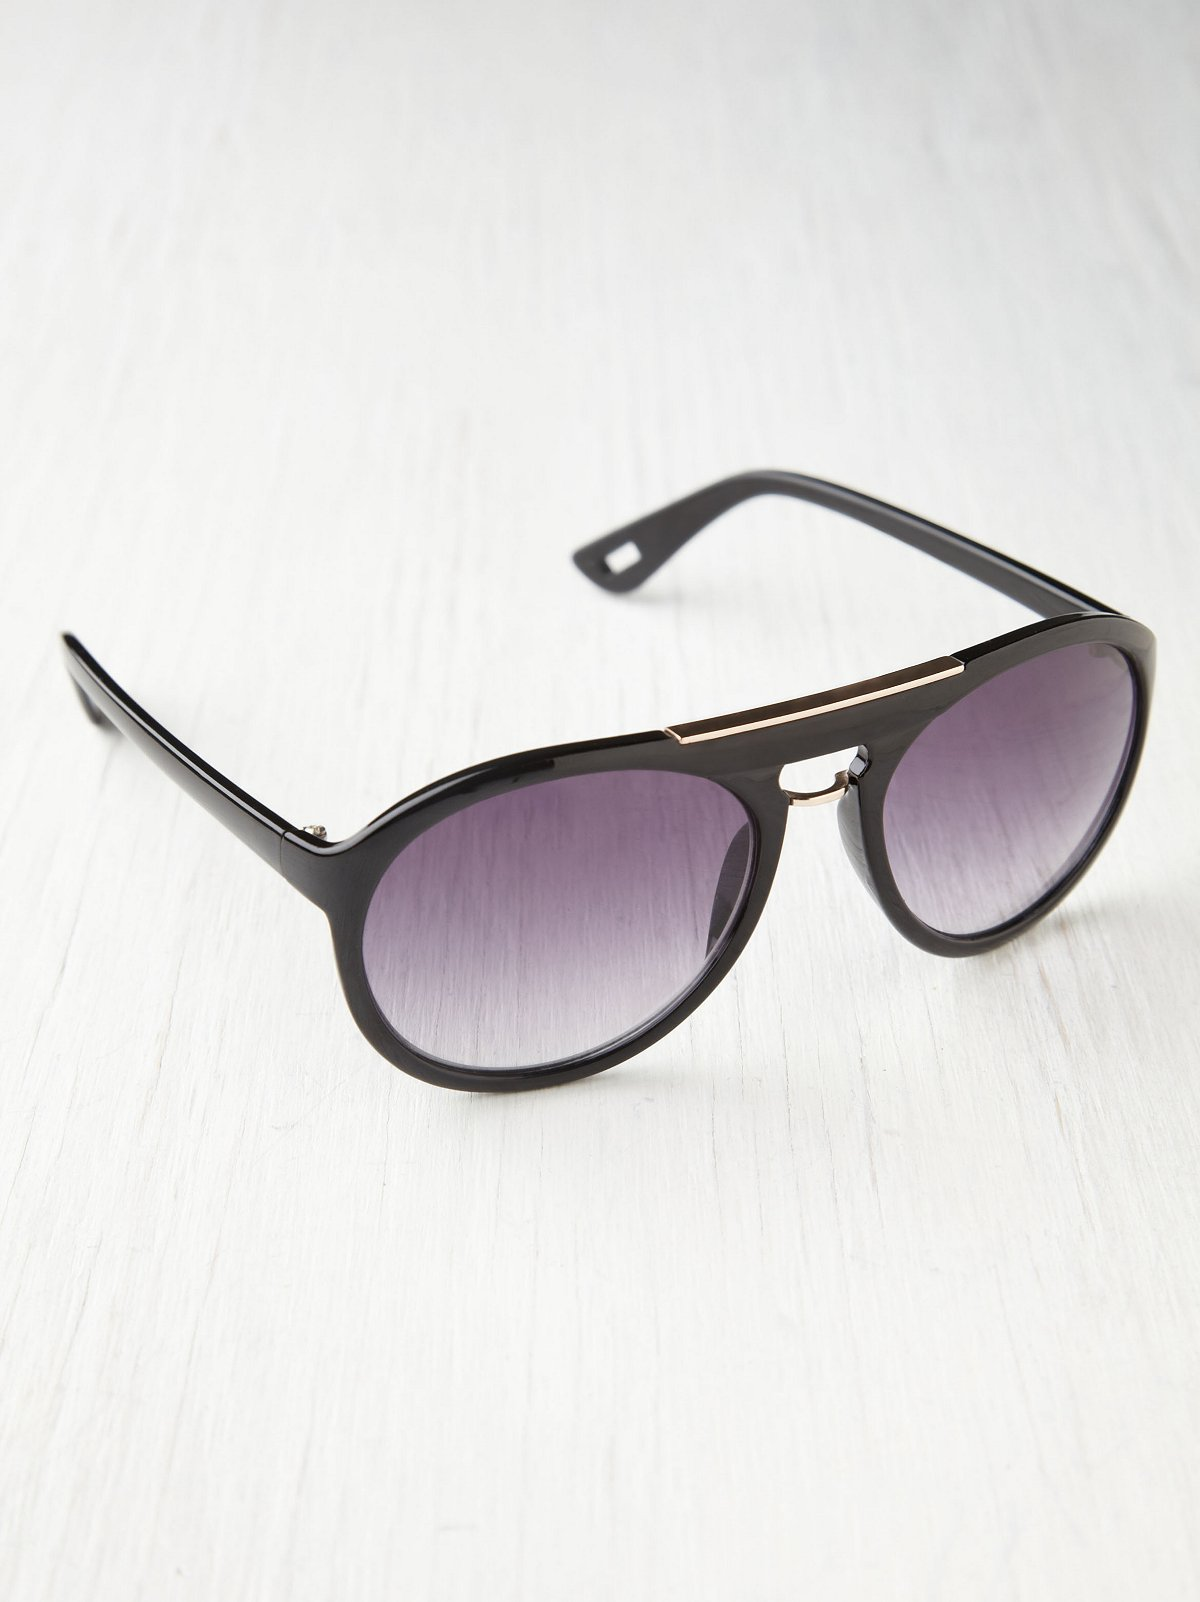 Starfleet Sunglasses